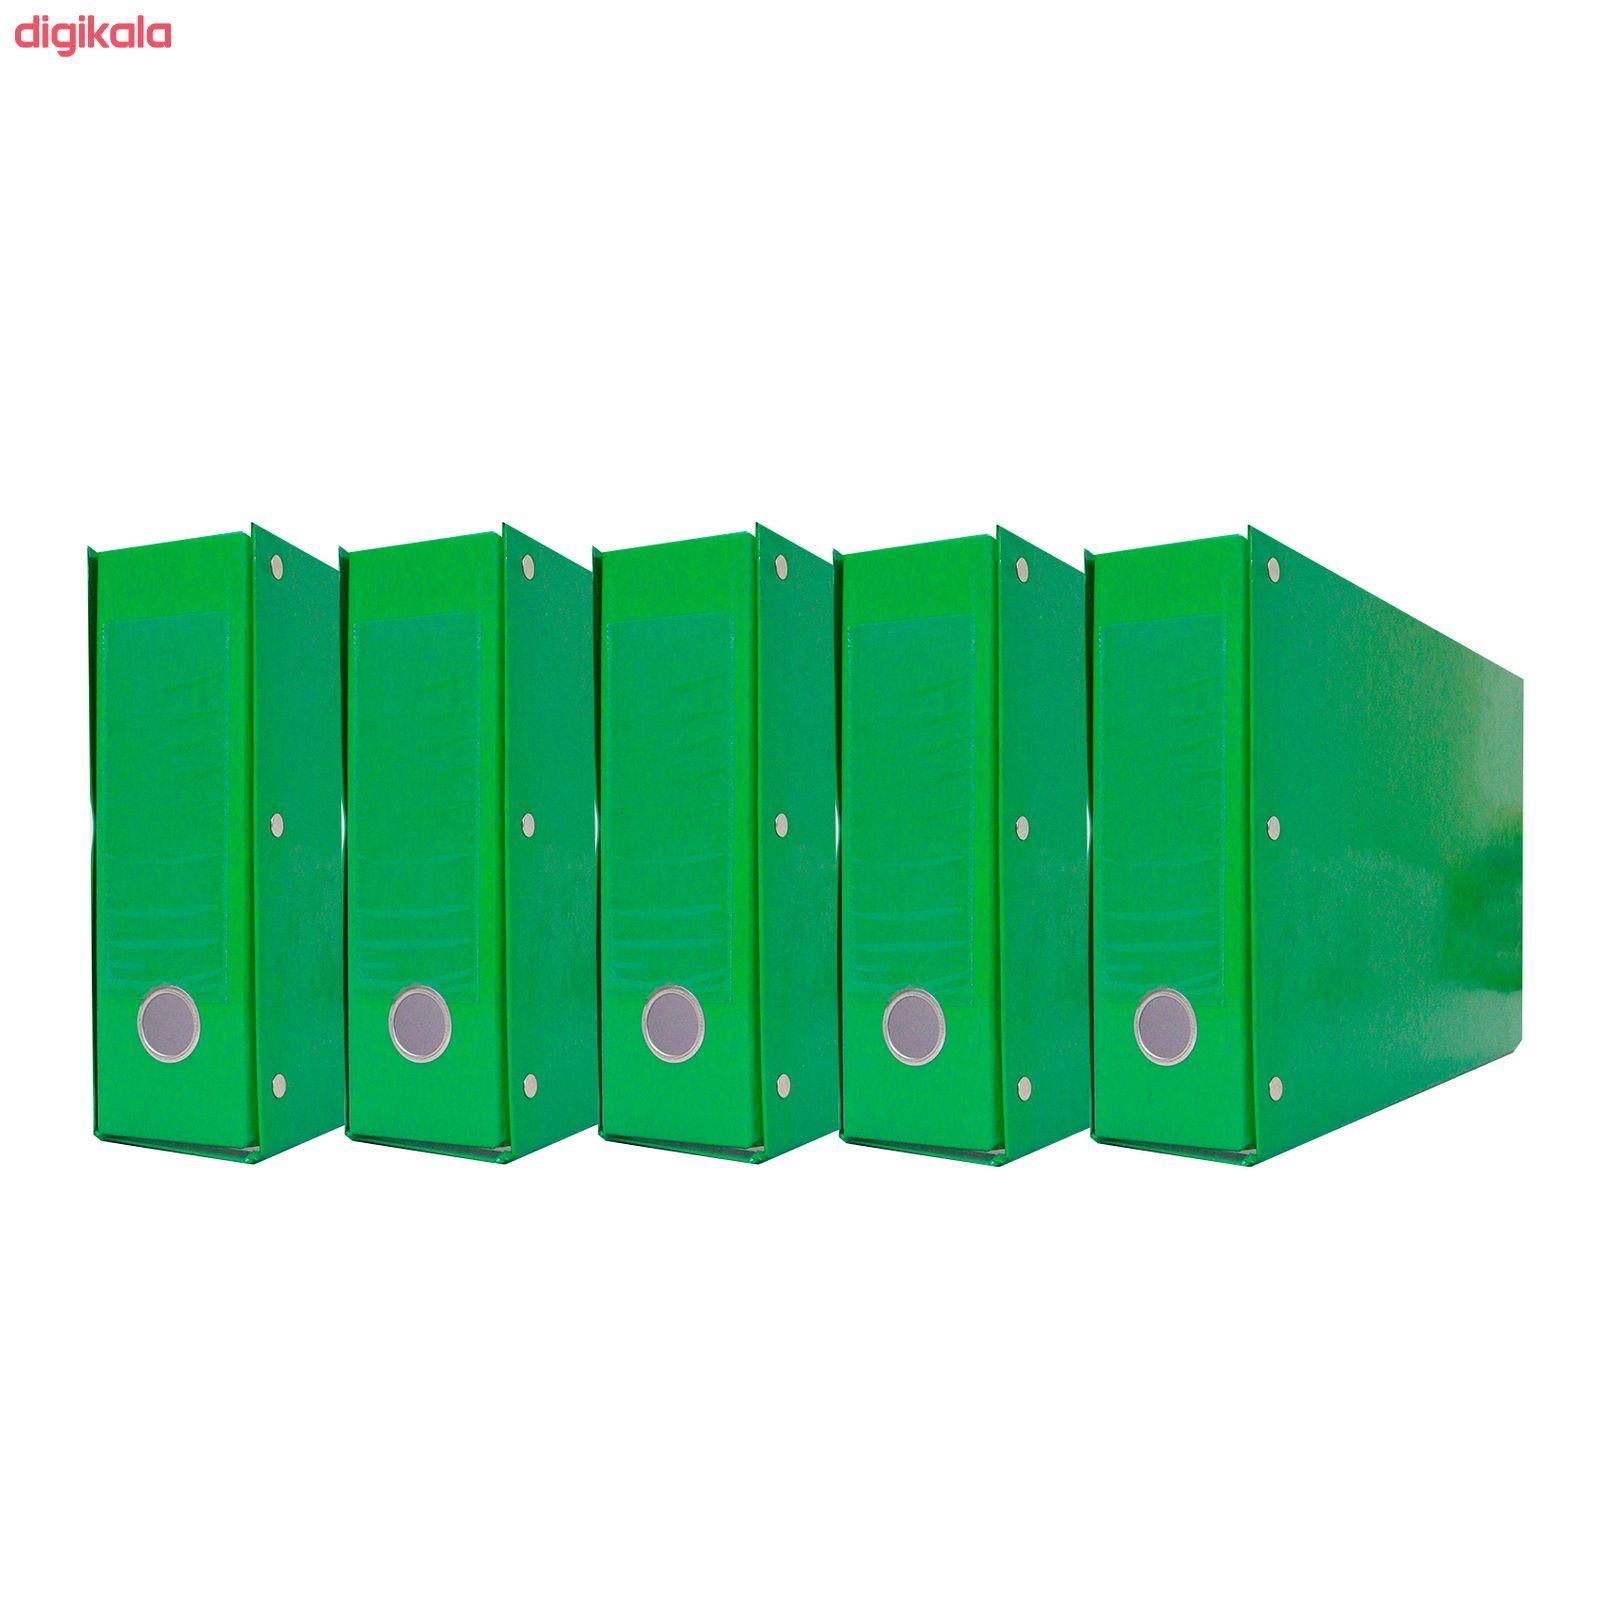 زونکن  کد 005 بسته 5 عددی main 1 2